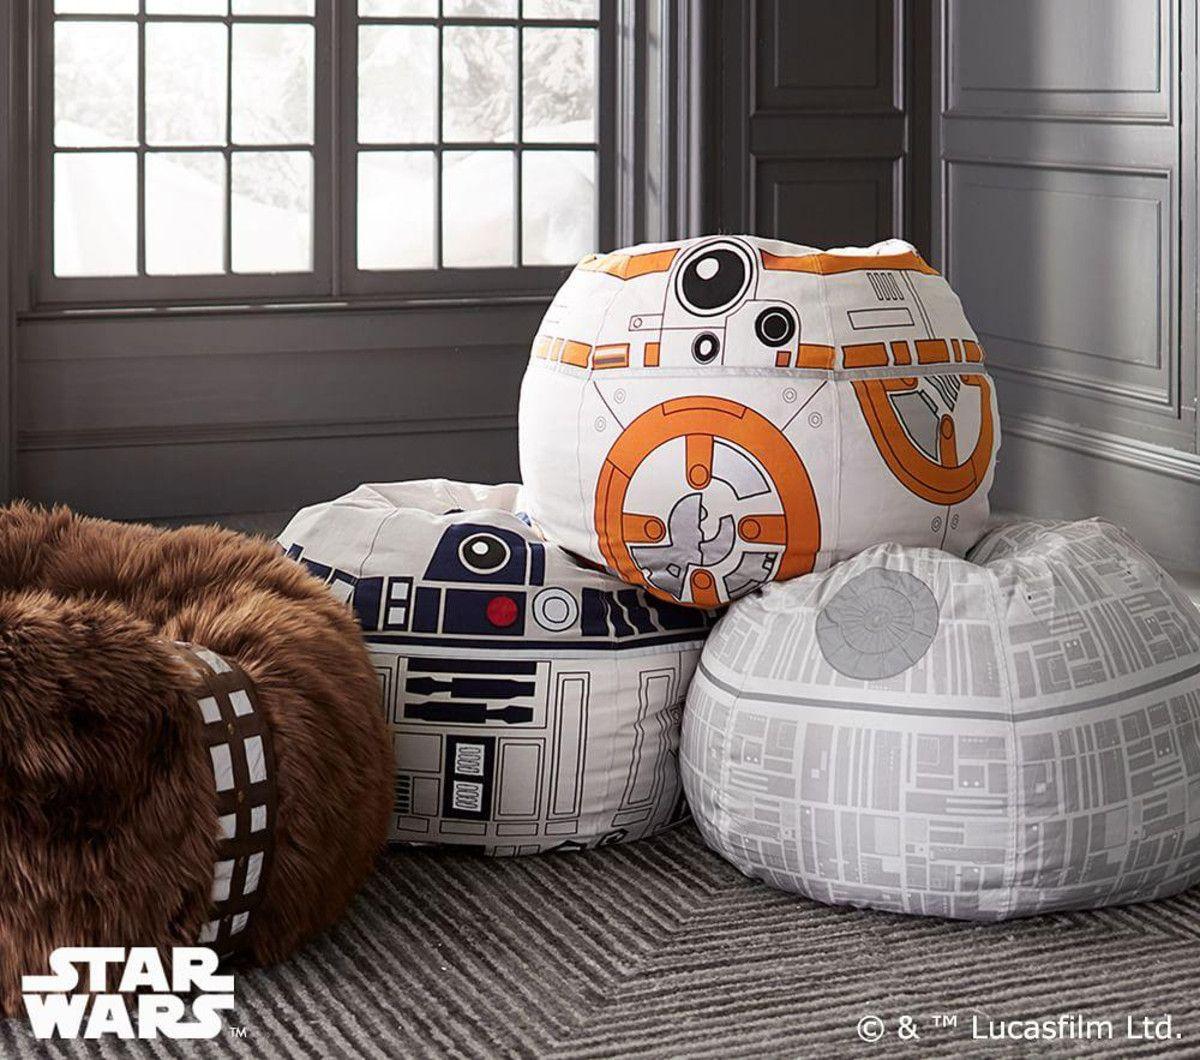 Star Wars Bean Bag Chair Garden Egg Covers R2 D2 Anywhere Beanbag Amanda Baby In 2019